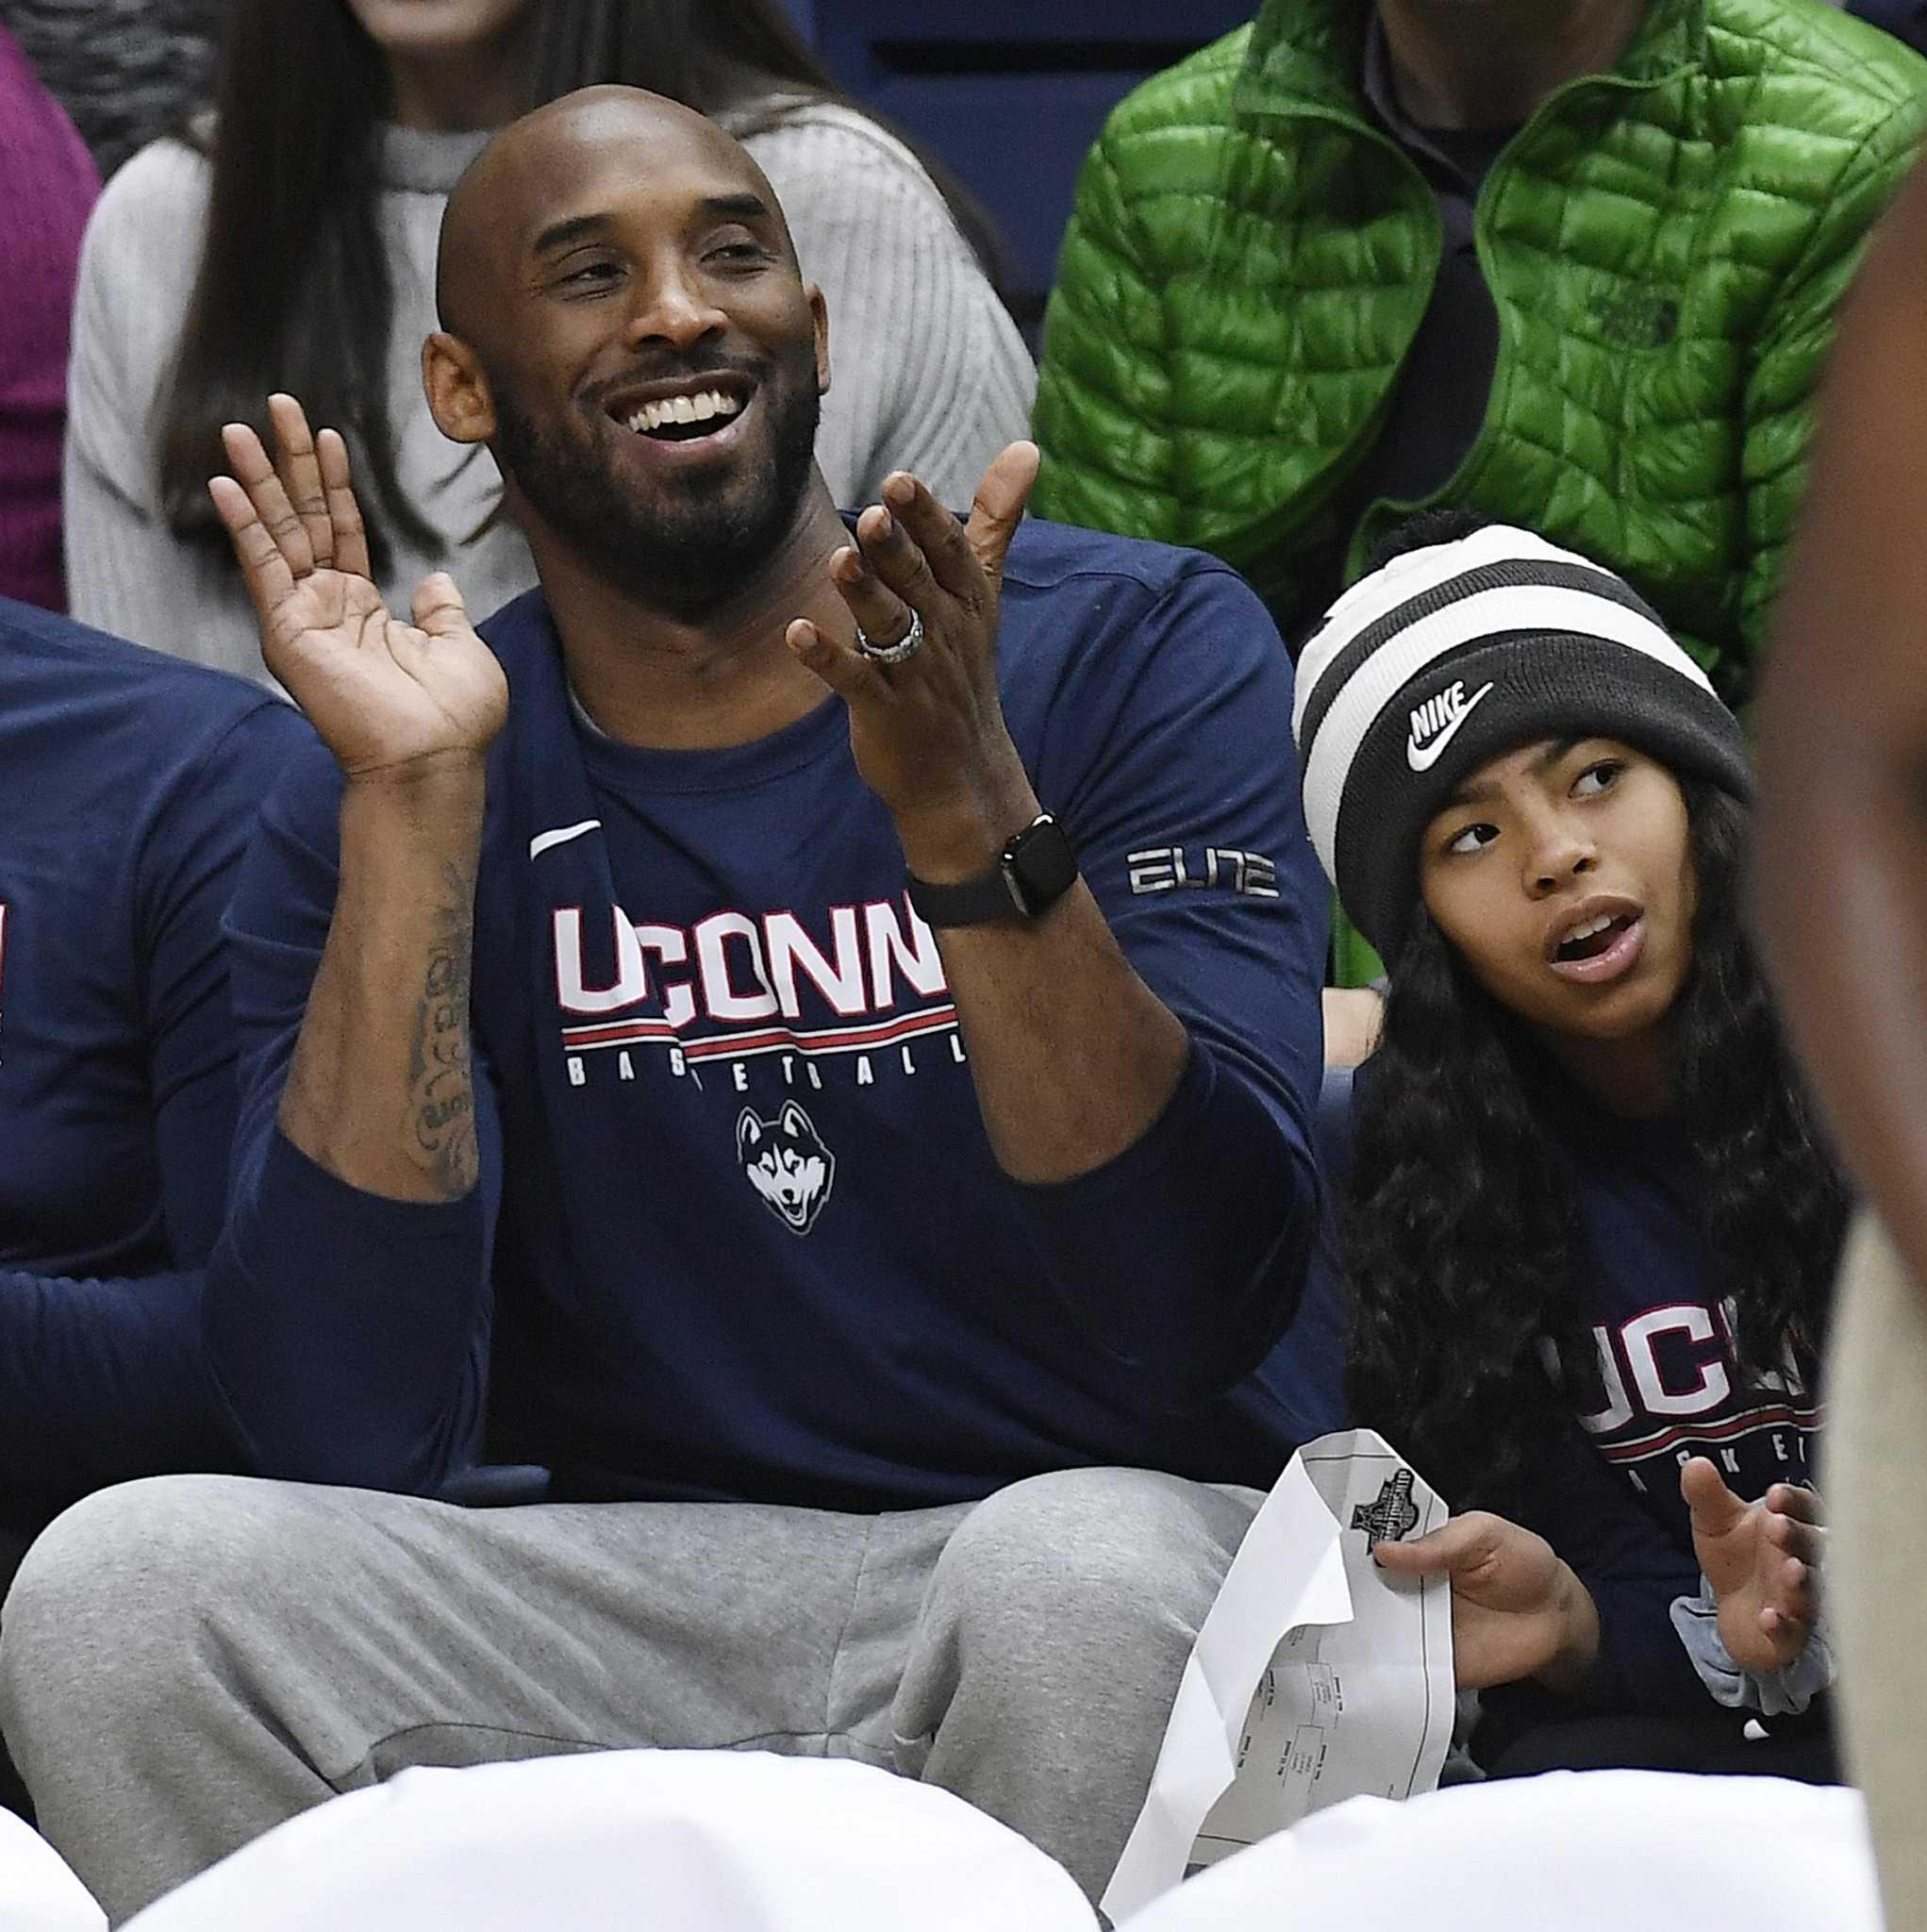 Kobe Bryant had strong ties to the UConn women's basketball program